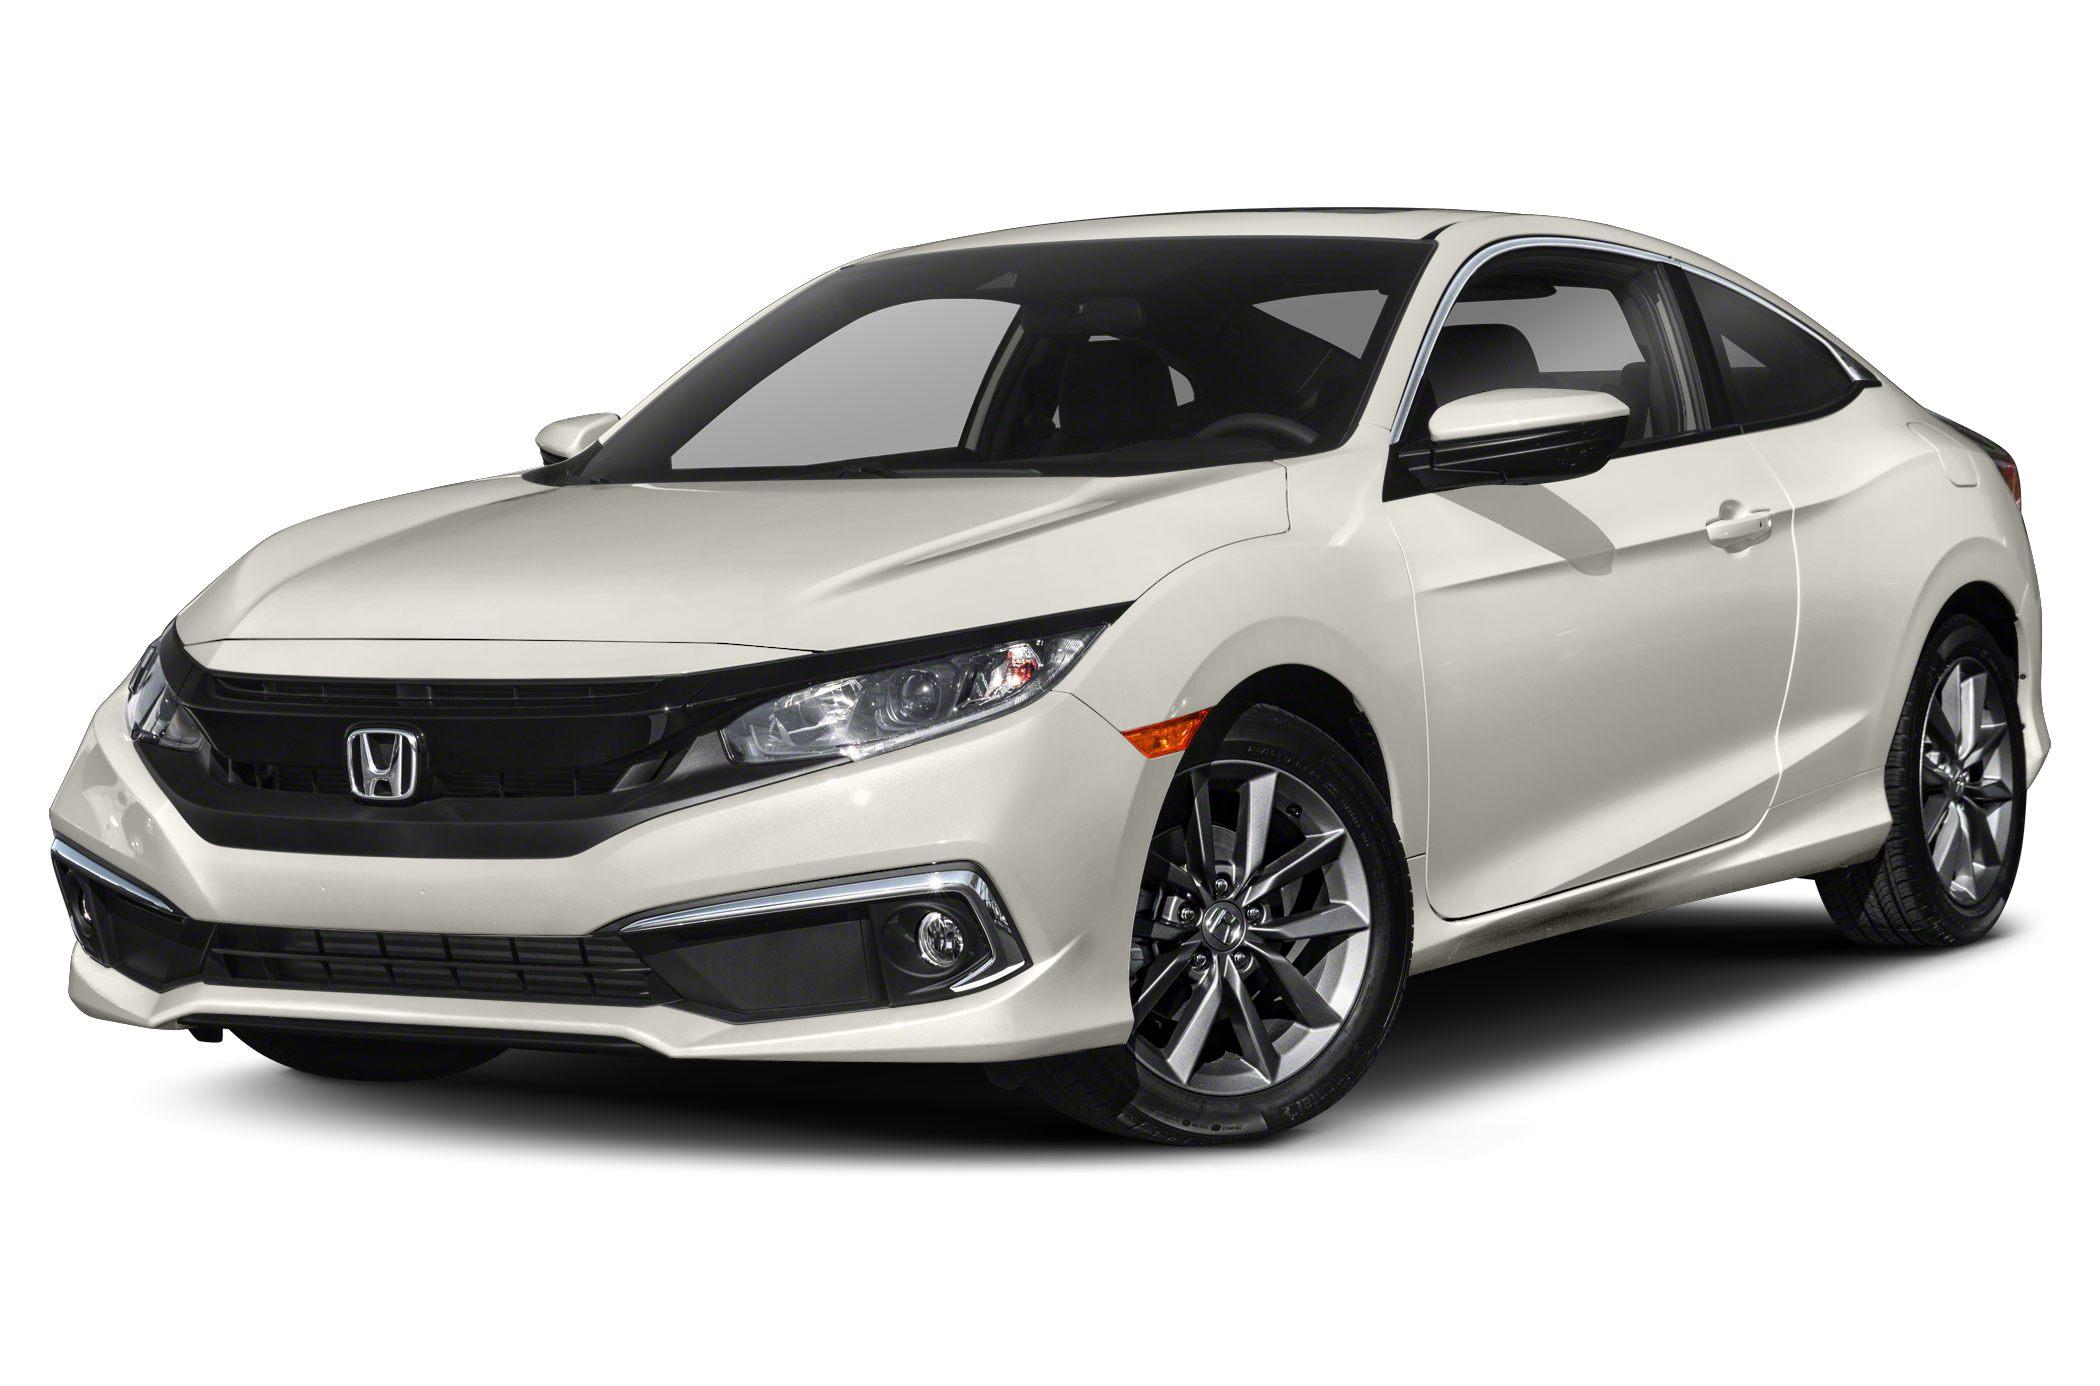 2020 Honda Civic EX 2dr Coupe